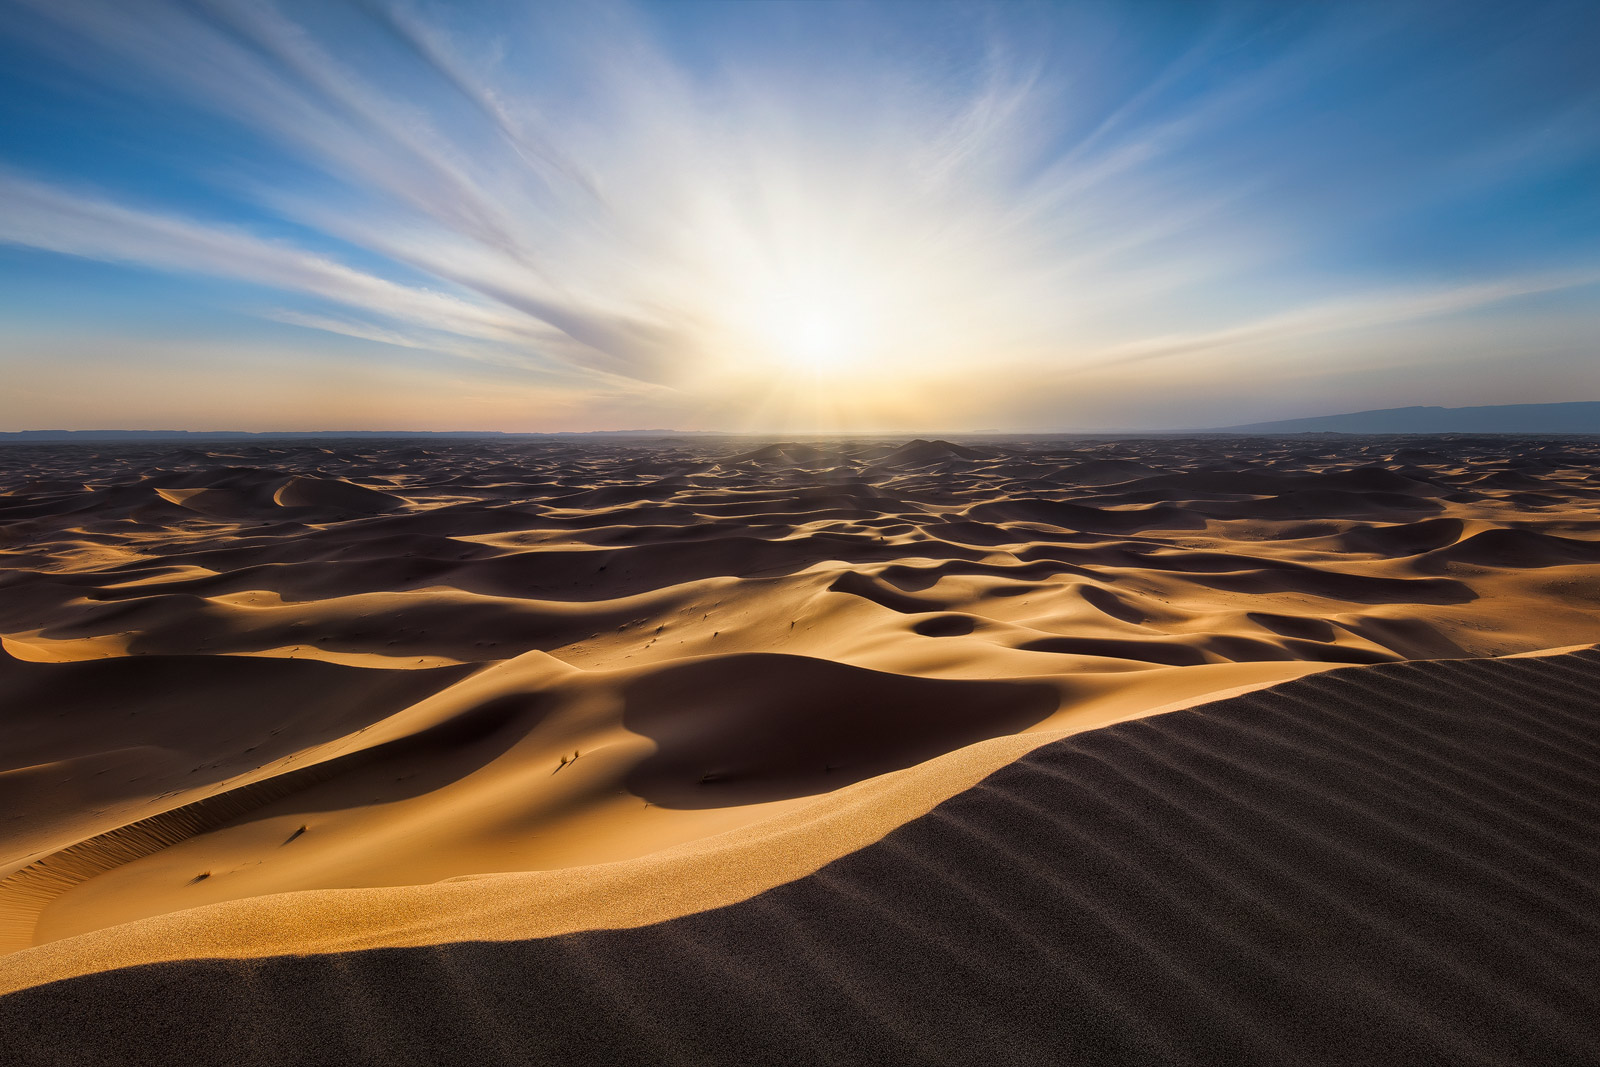 Erg Chigaga or Erg Chebbi dunes? Infinite Sands by Michael Breitung.